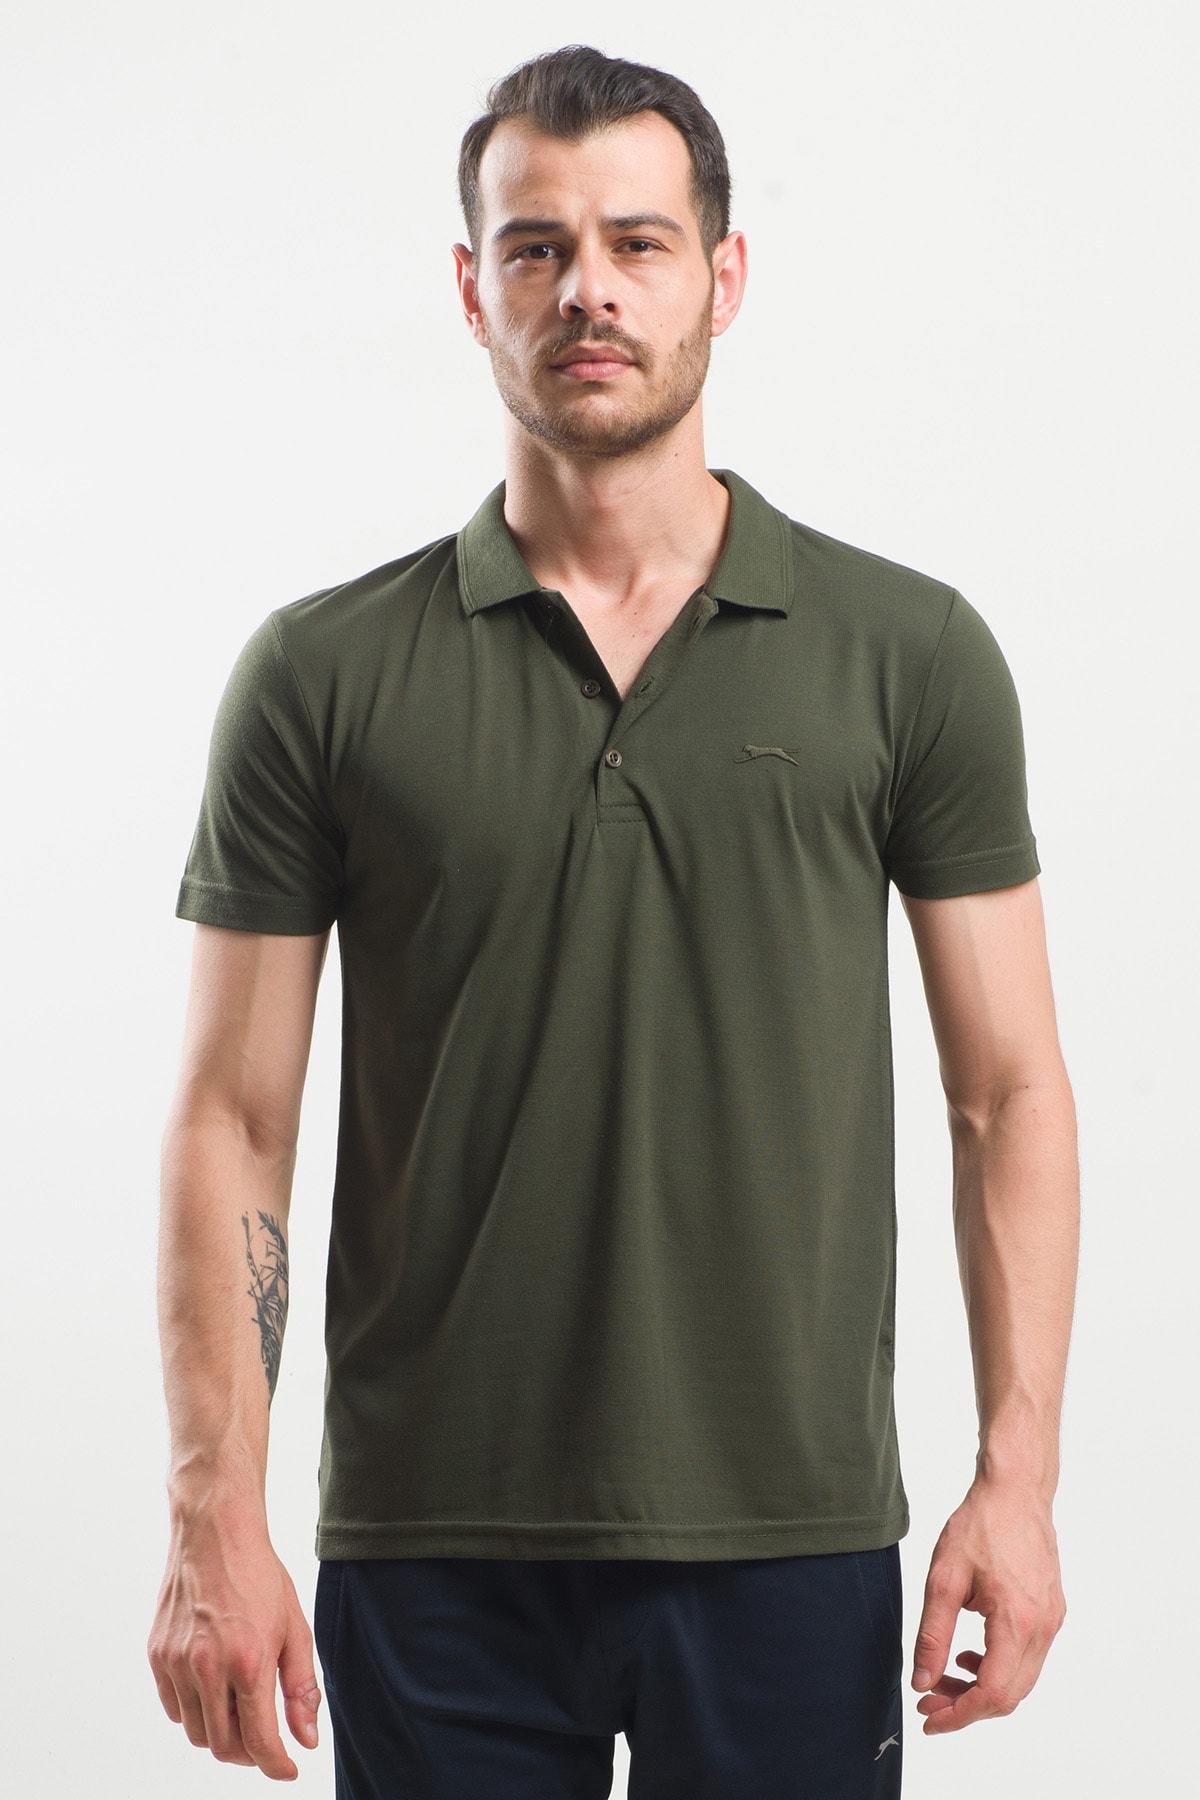 Slazenger Spırıt Erkek T-shirt Haki 1